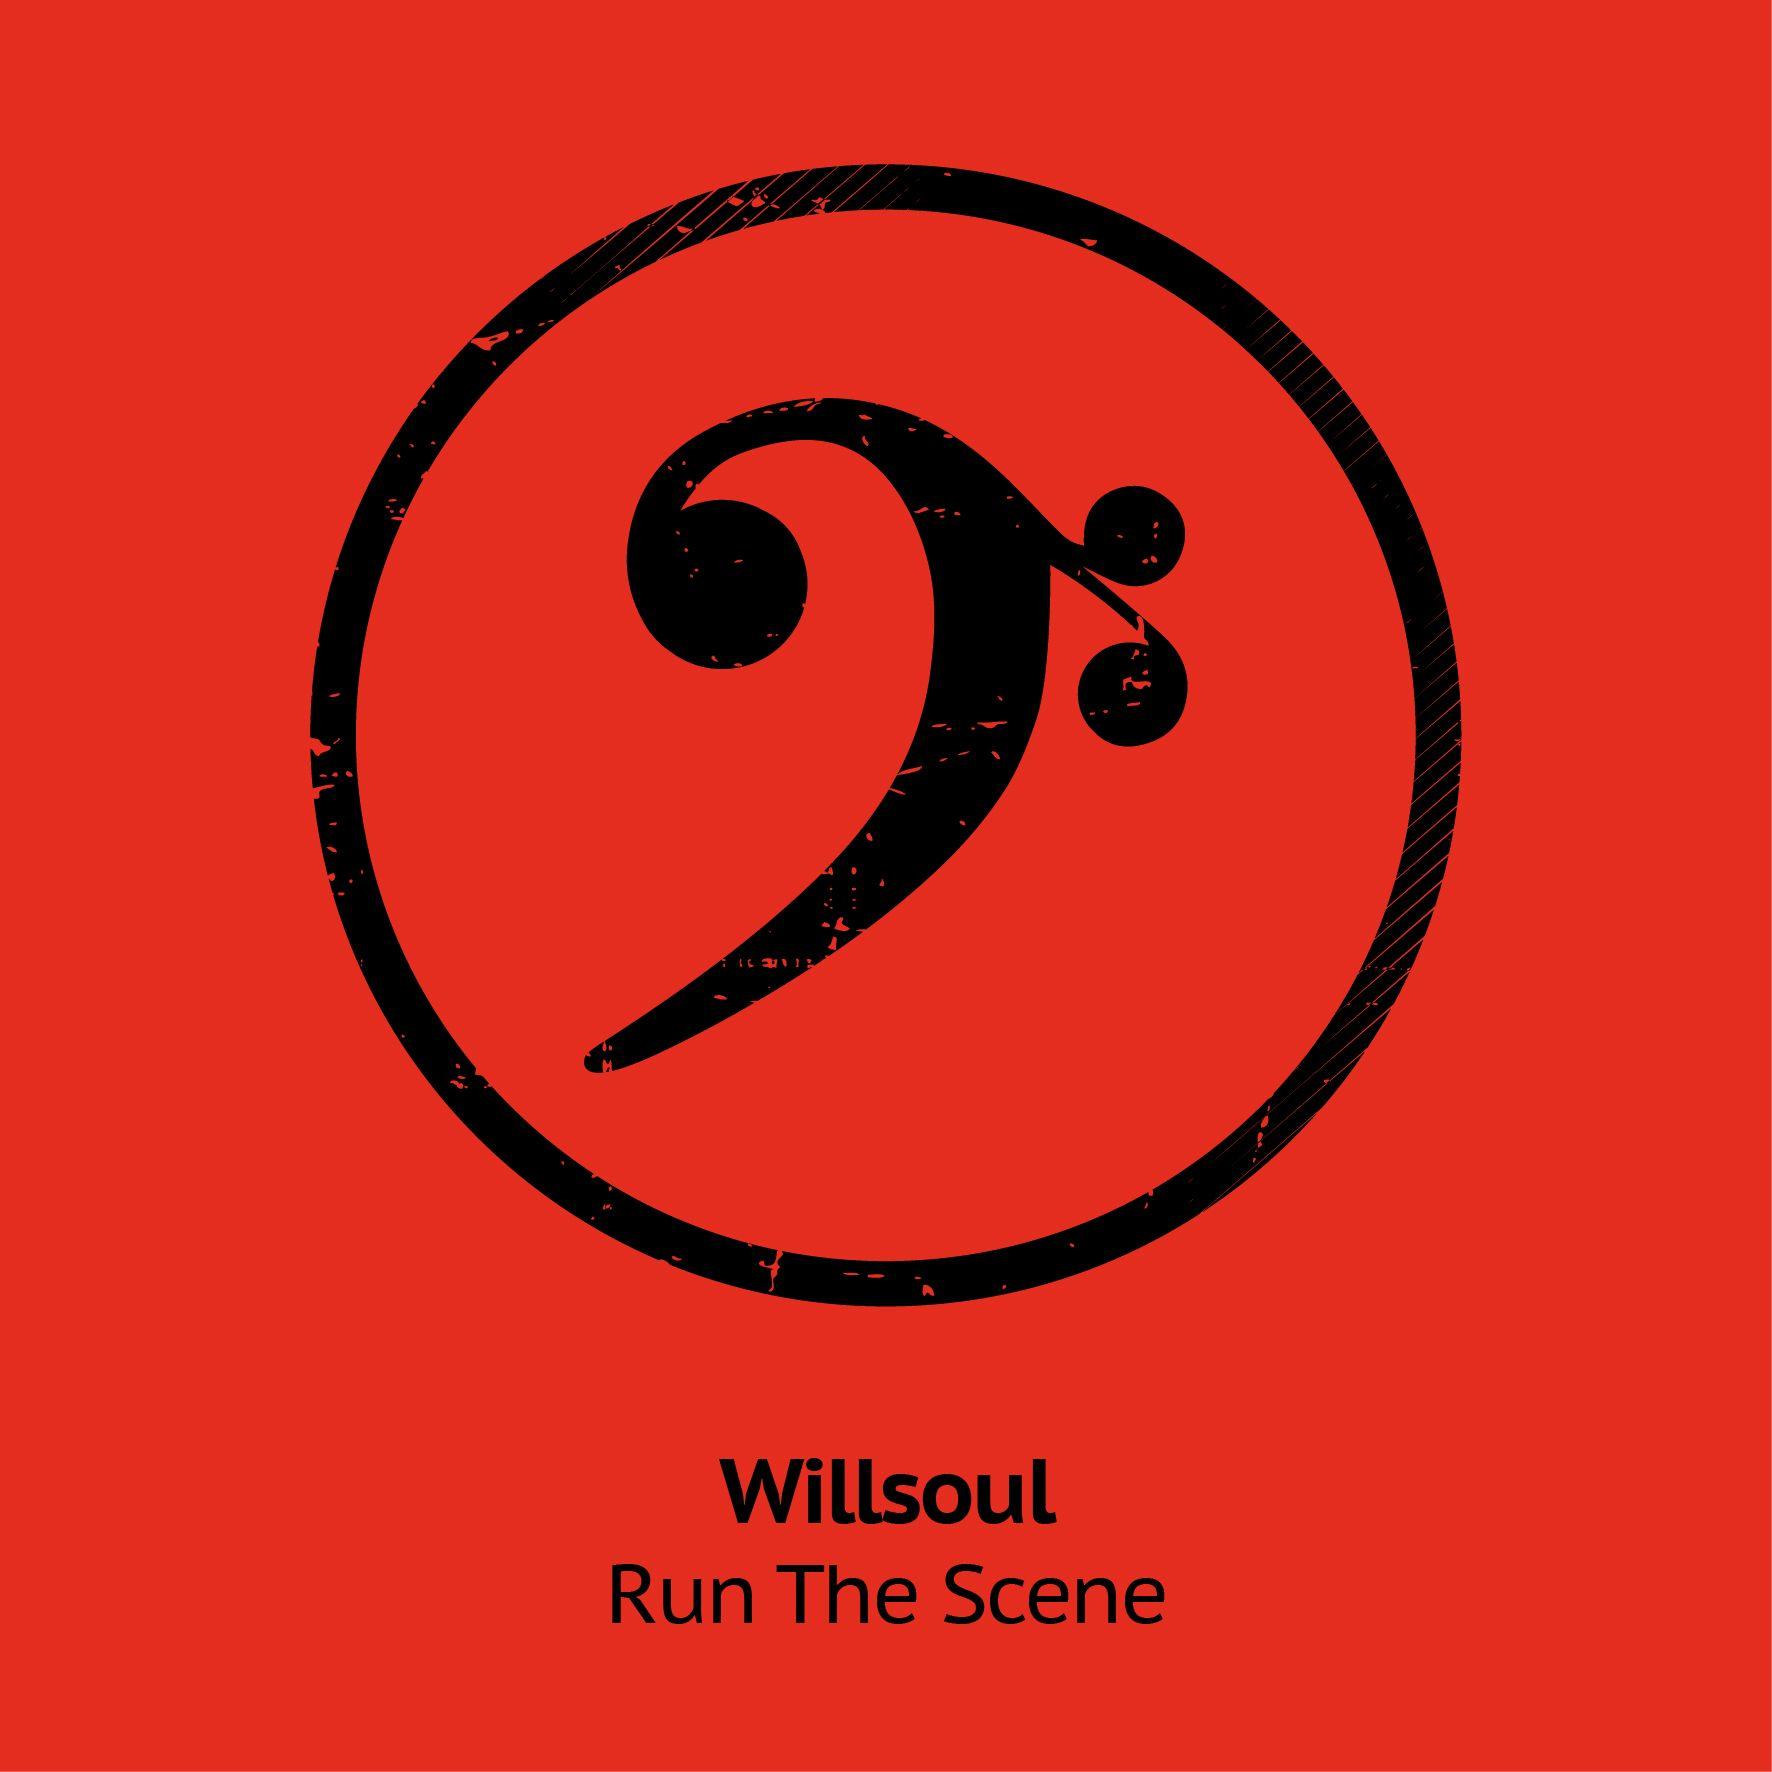 cur004_willsoul_run_the_scene.jpg